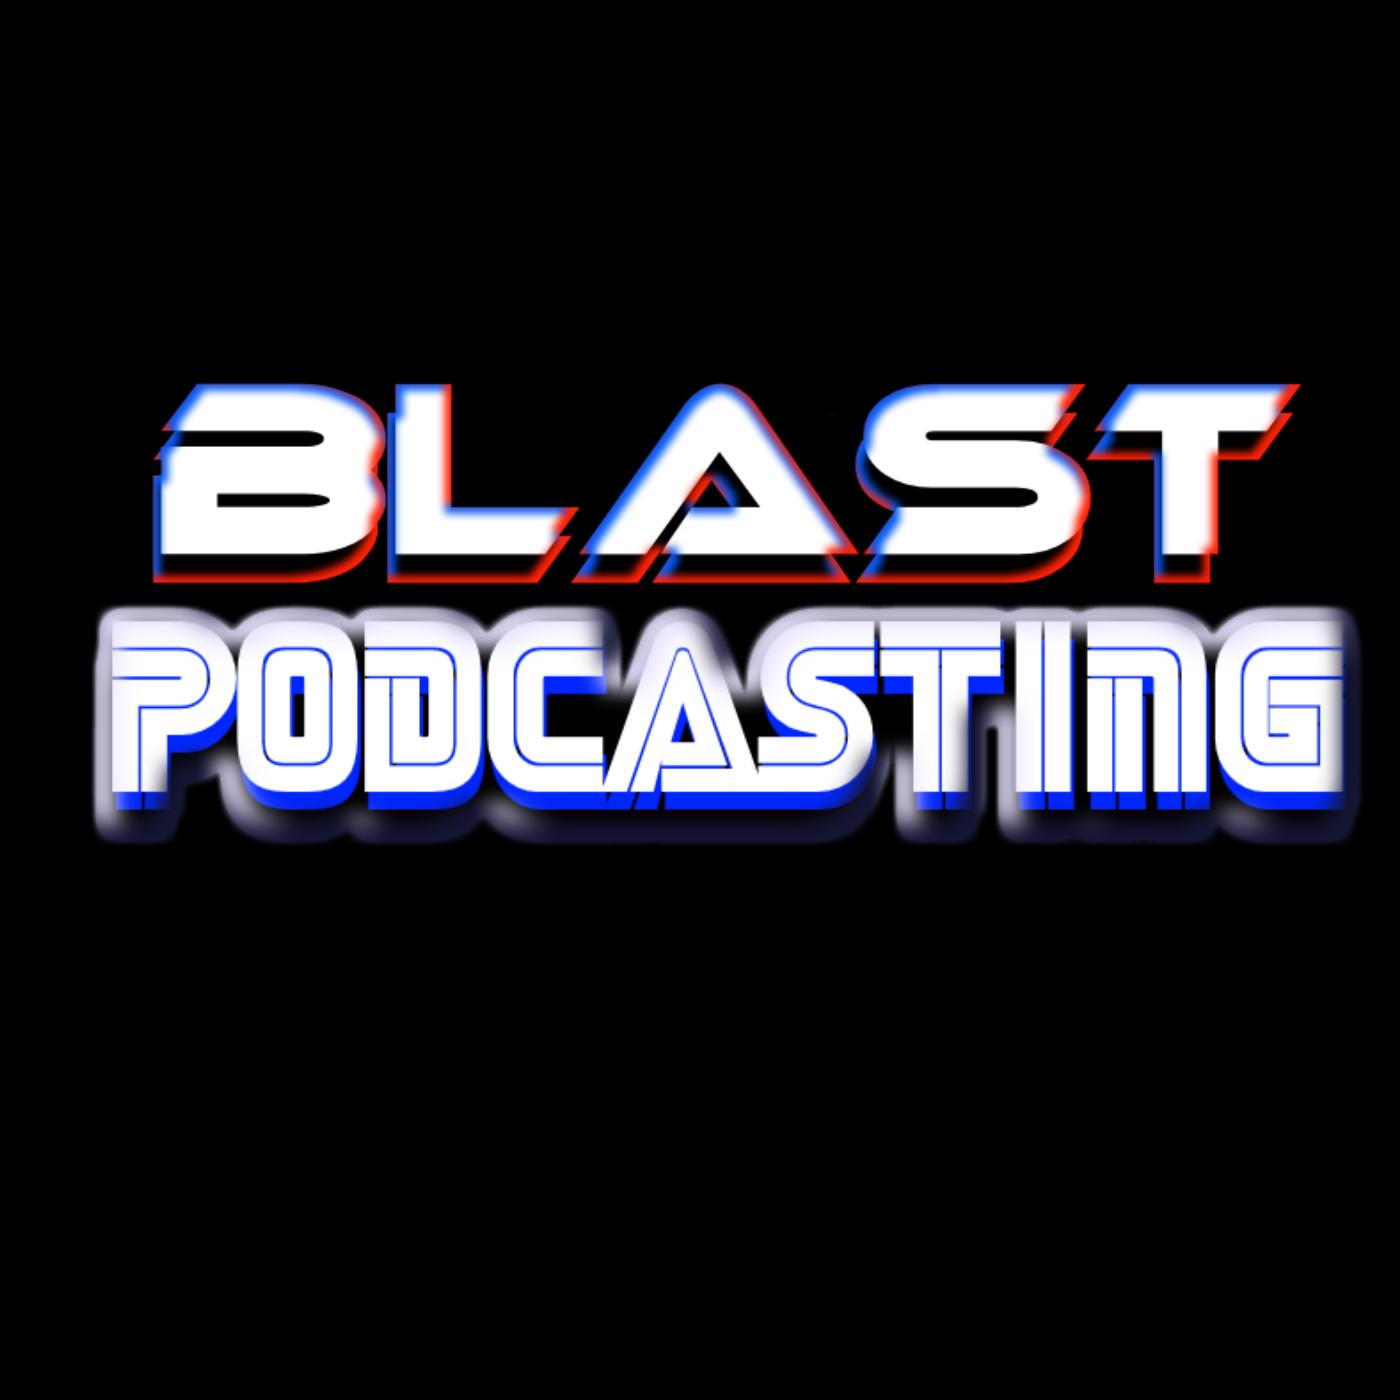 Blast Podcasting